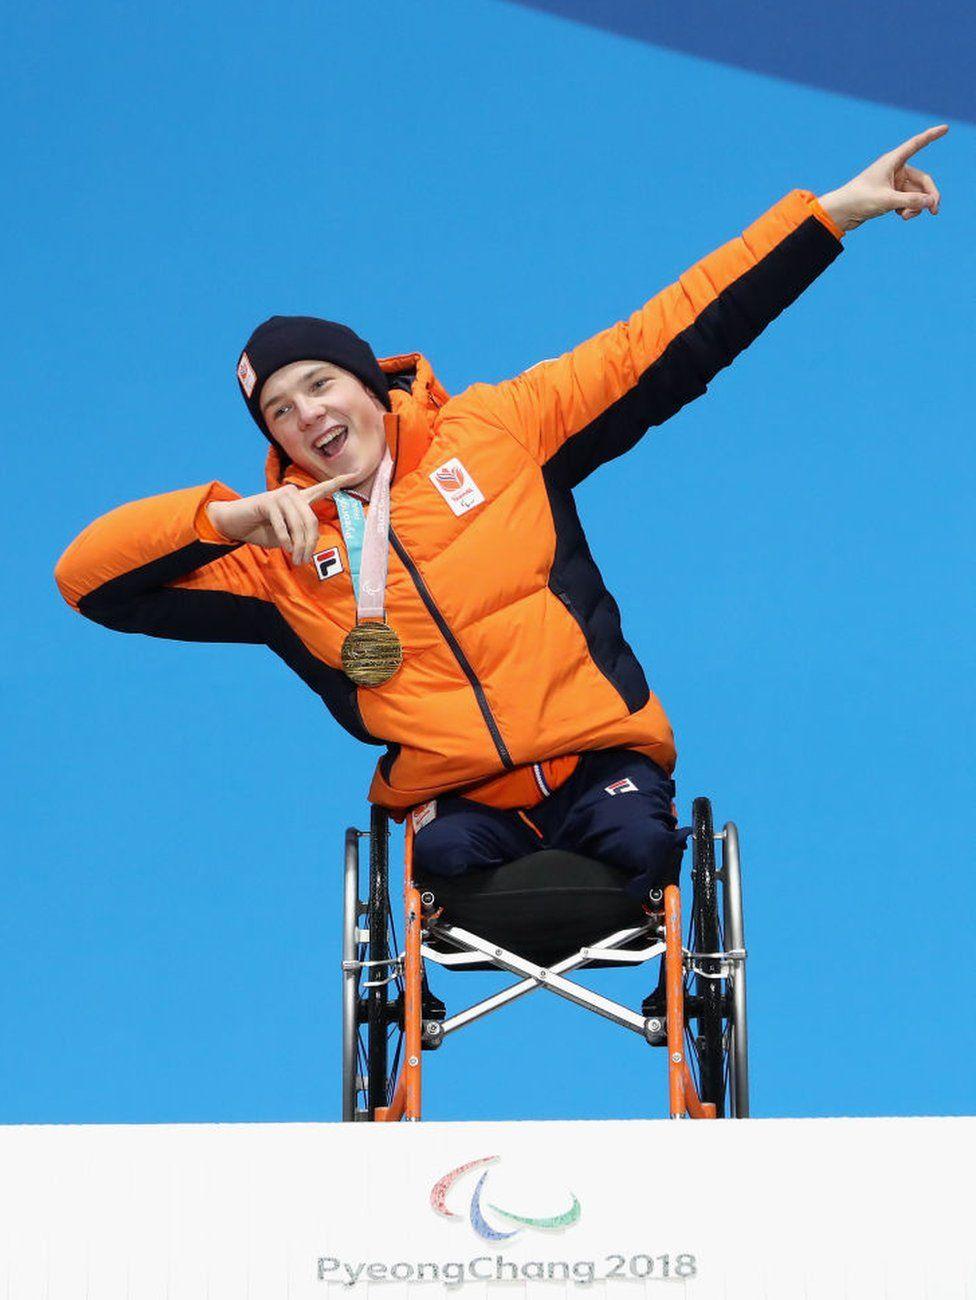 Gold medallist Jeroen Kampschreur poses on the podium after winning a gold medal